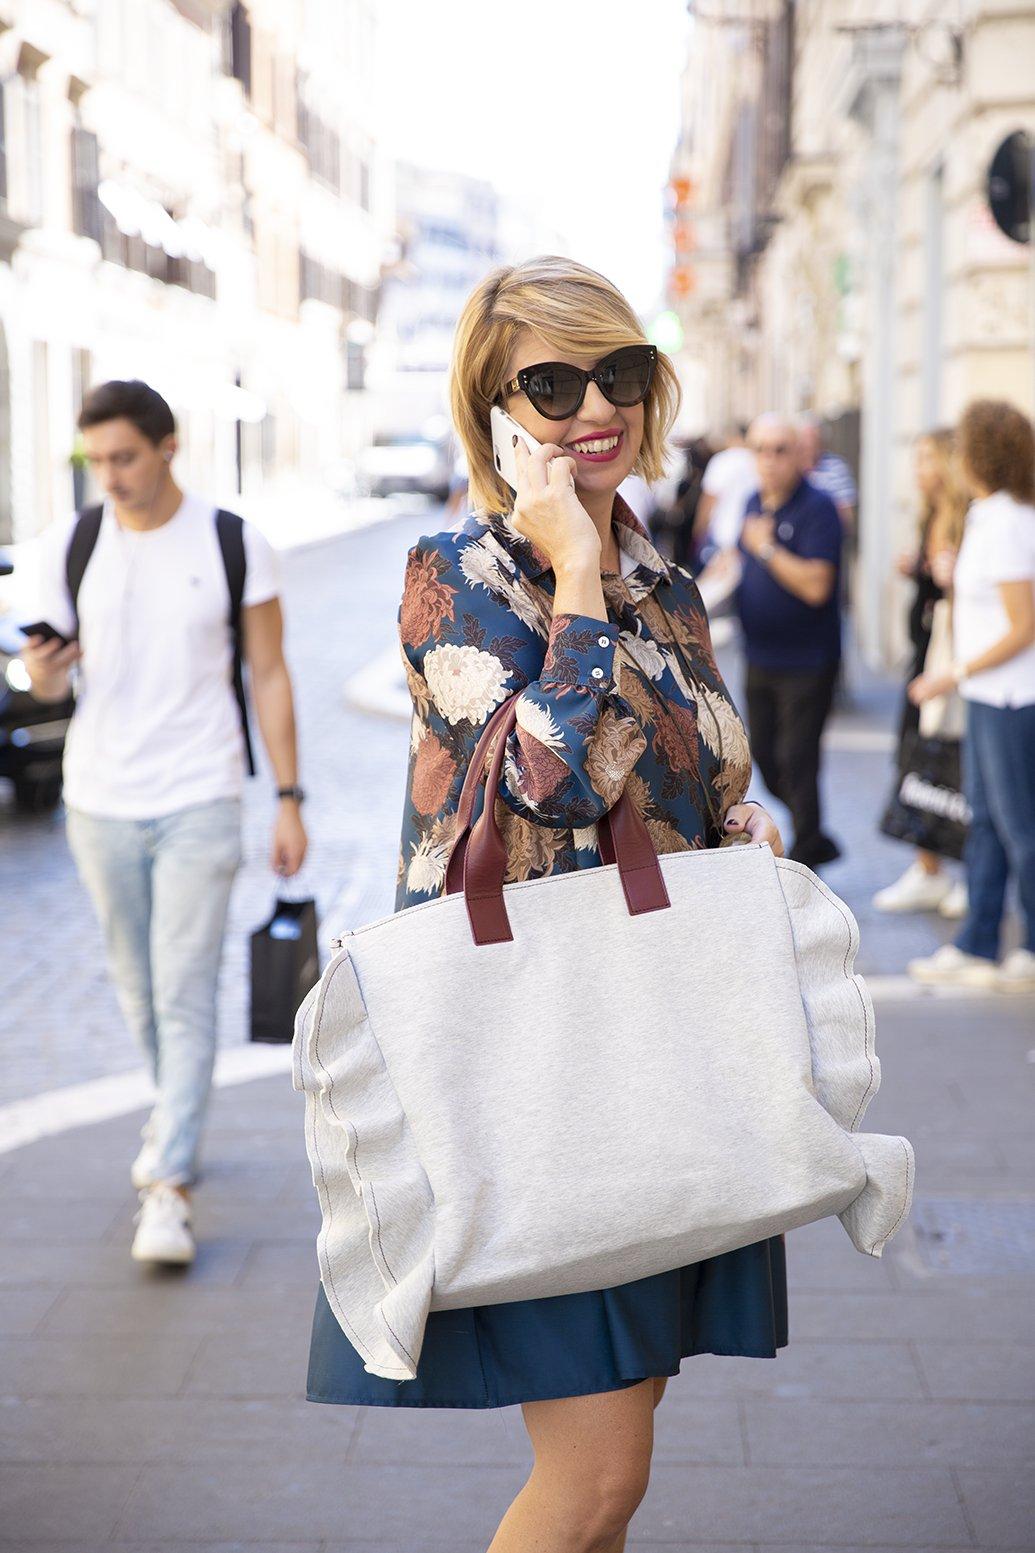 la borsa shopping di Amahra